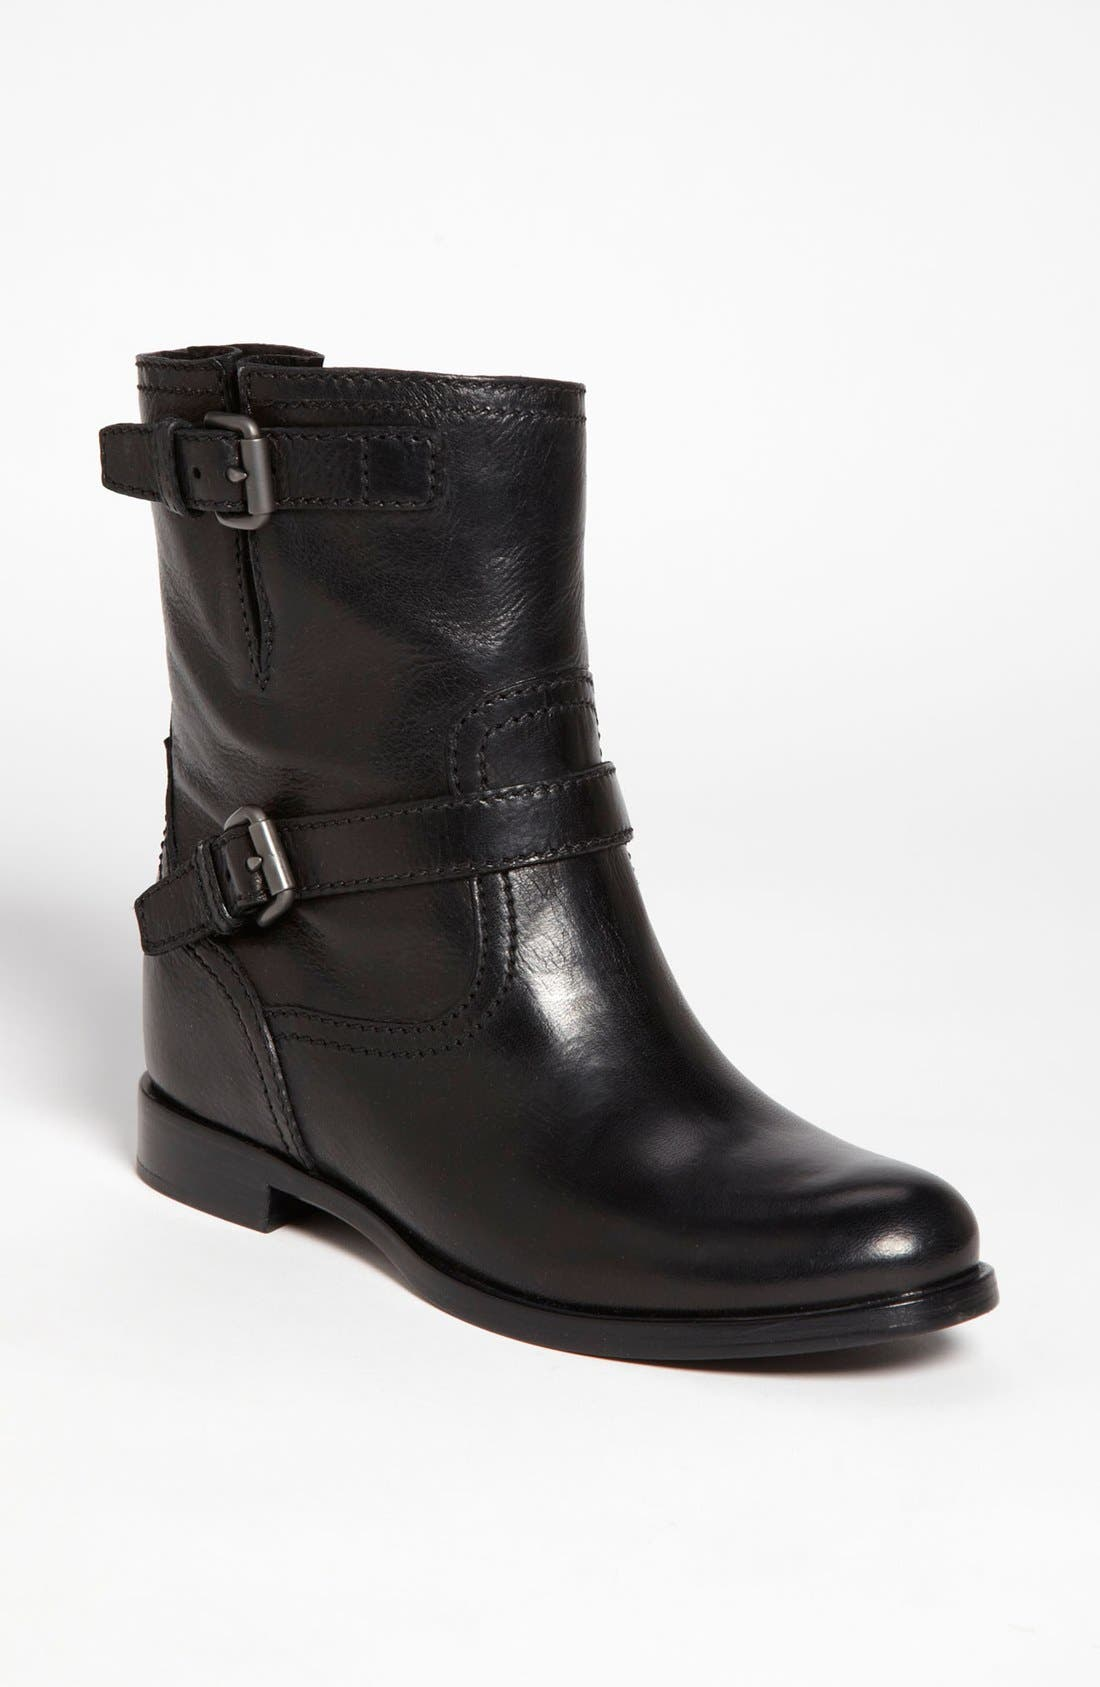 Alternate Image 1 Selected - Prada Double Buckle Short Boot (Women)